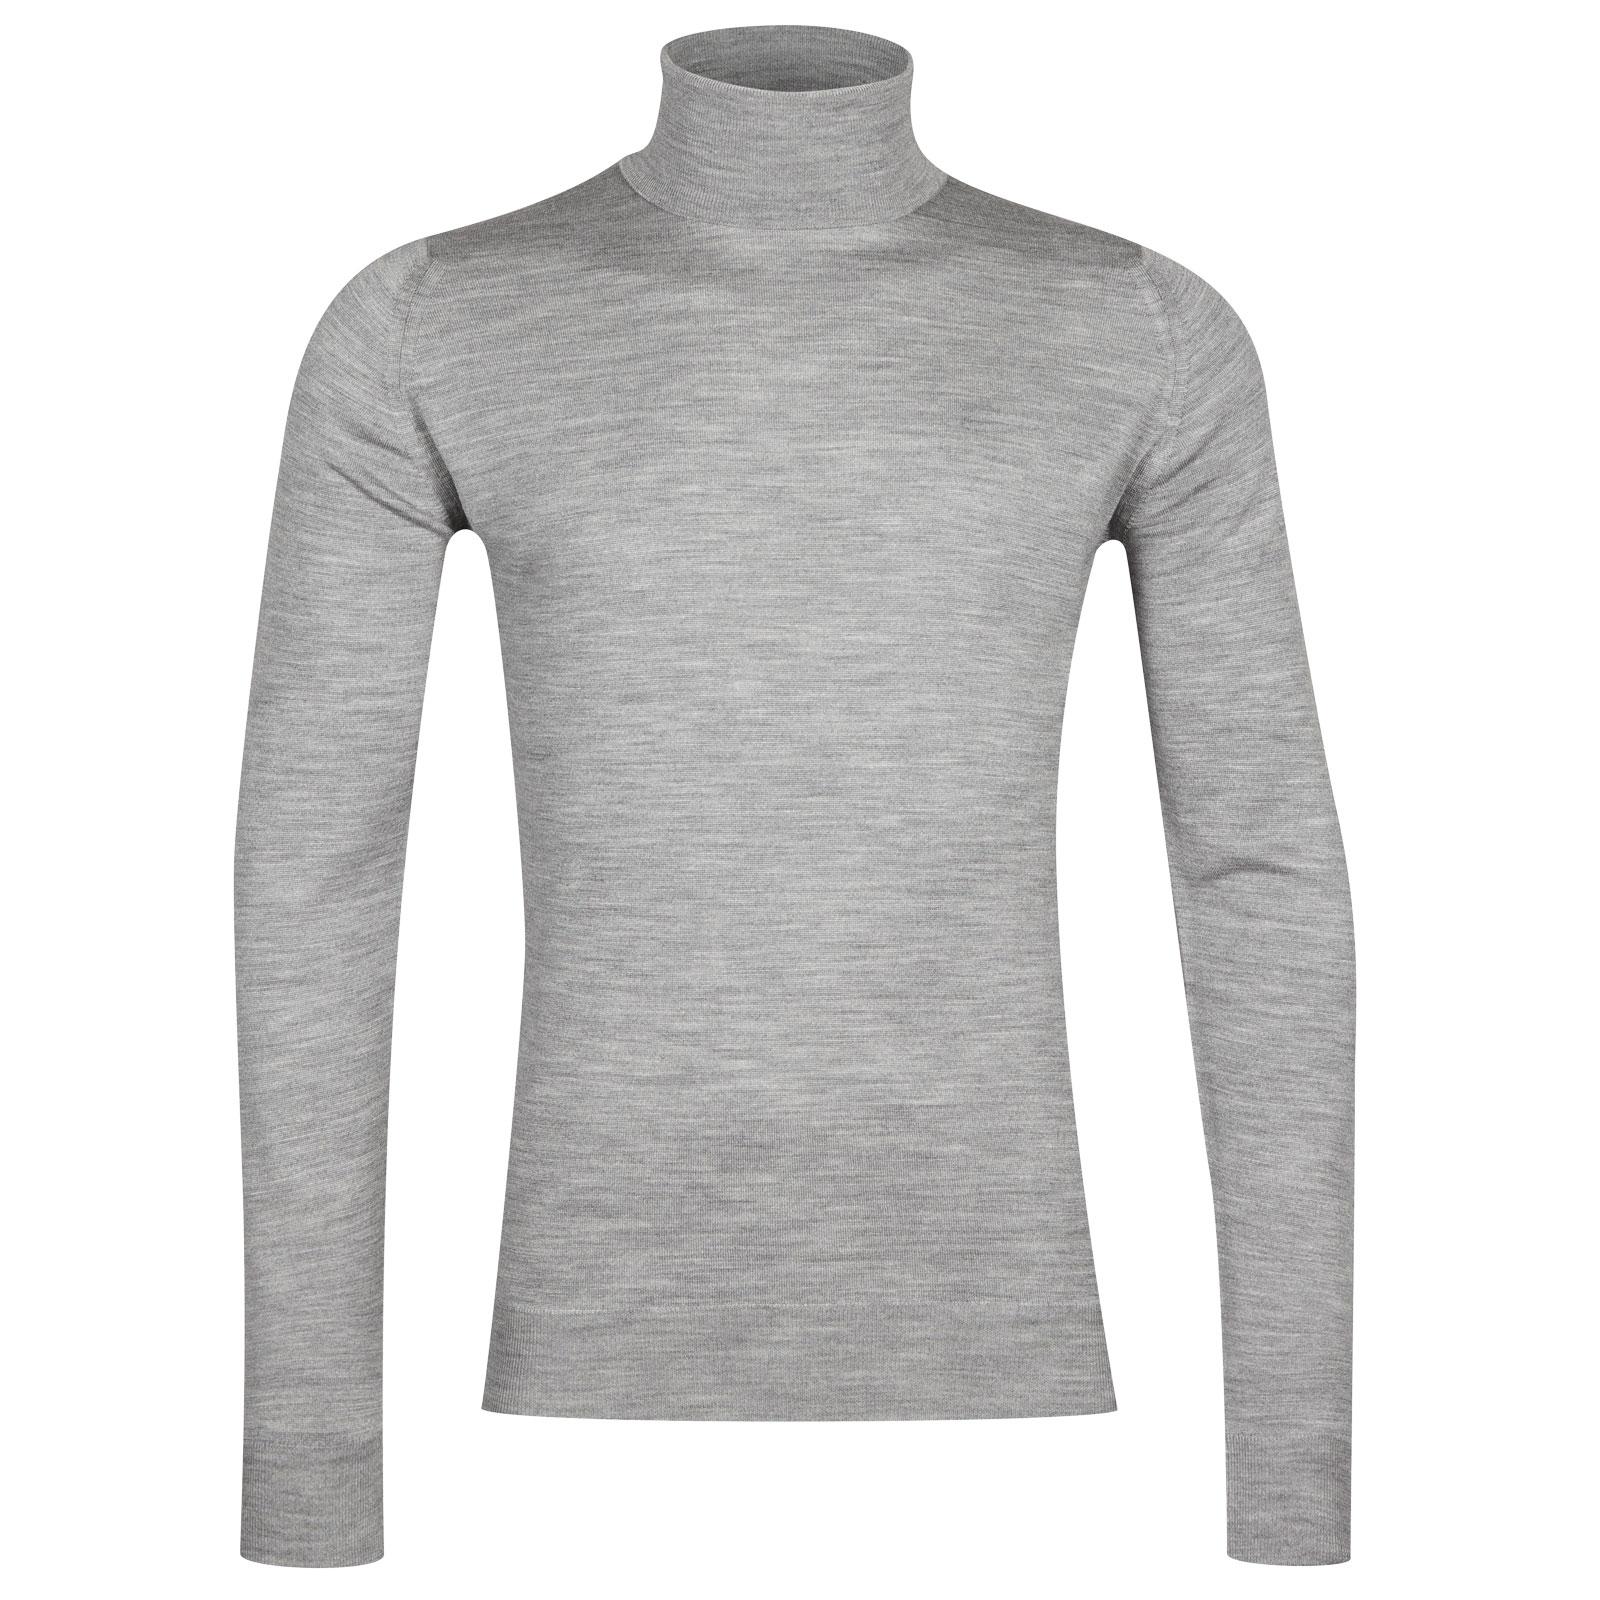 John Smedley cherwell Merino Wool Pullover in Silver-XL